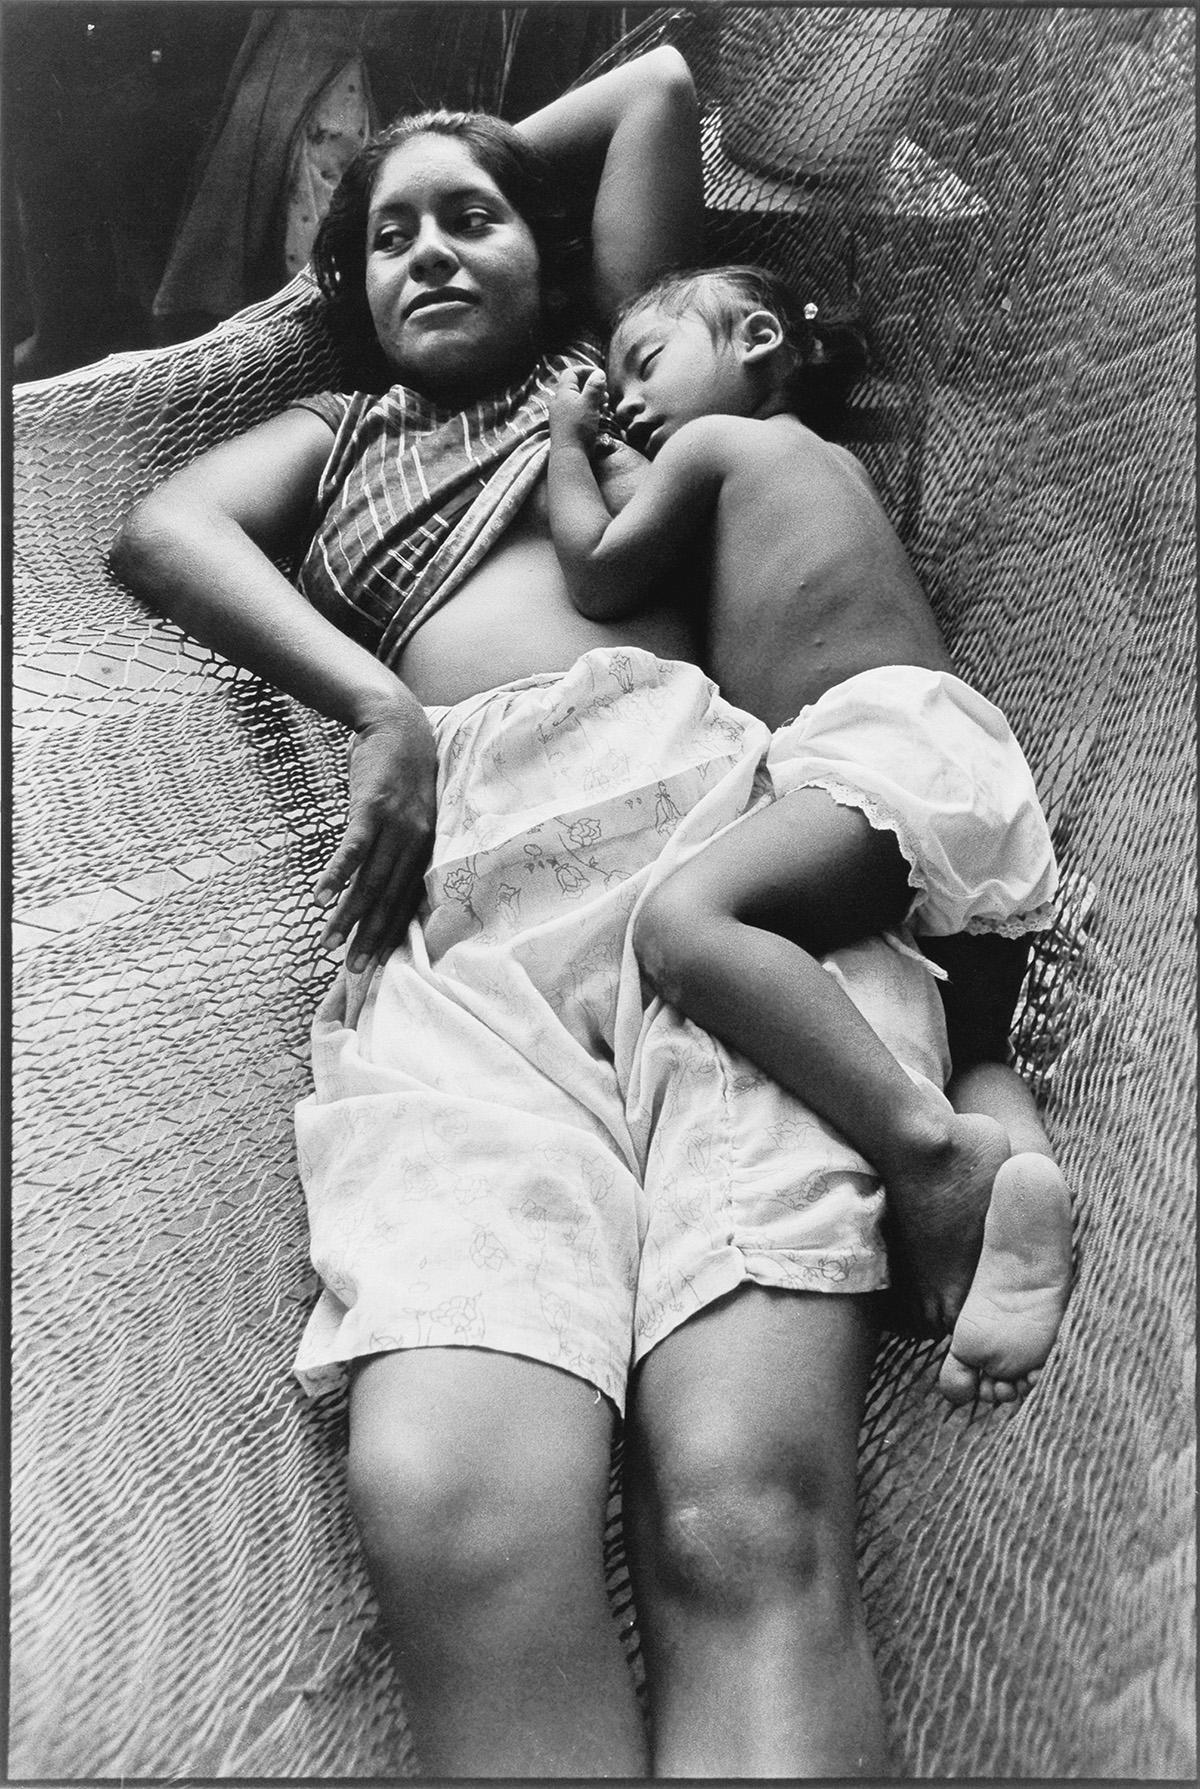 GRACIELA ITURBIDE (1942- ) Choice suite of 5 photographs from Mujeres de Juchitan.